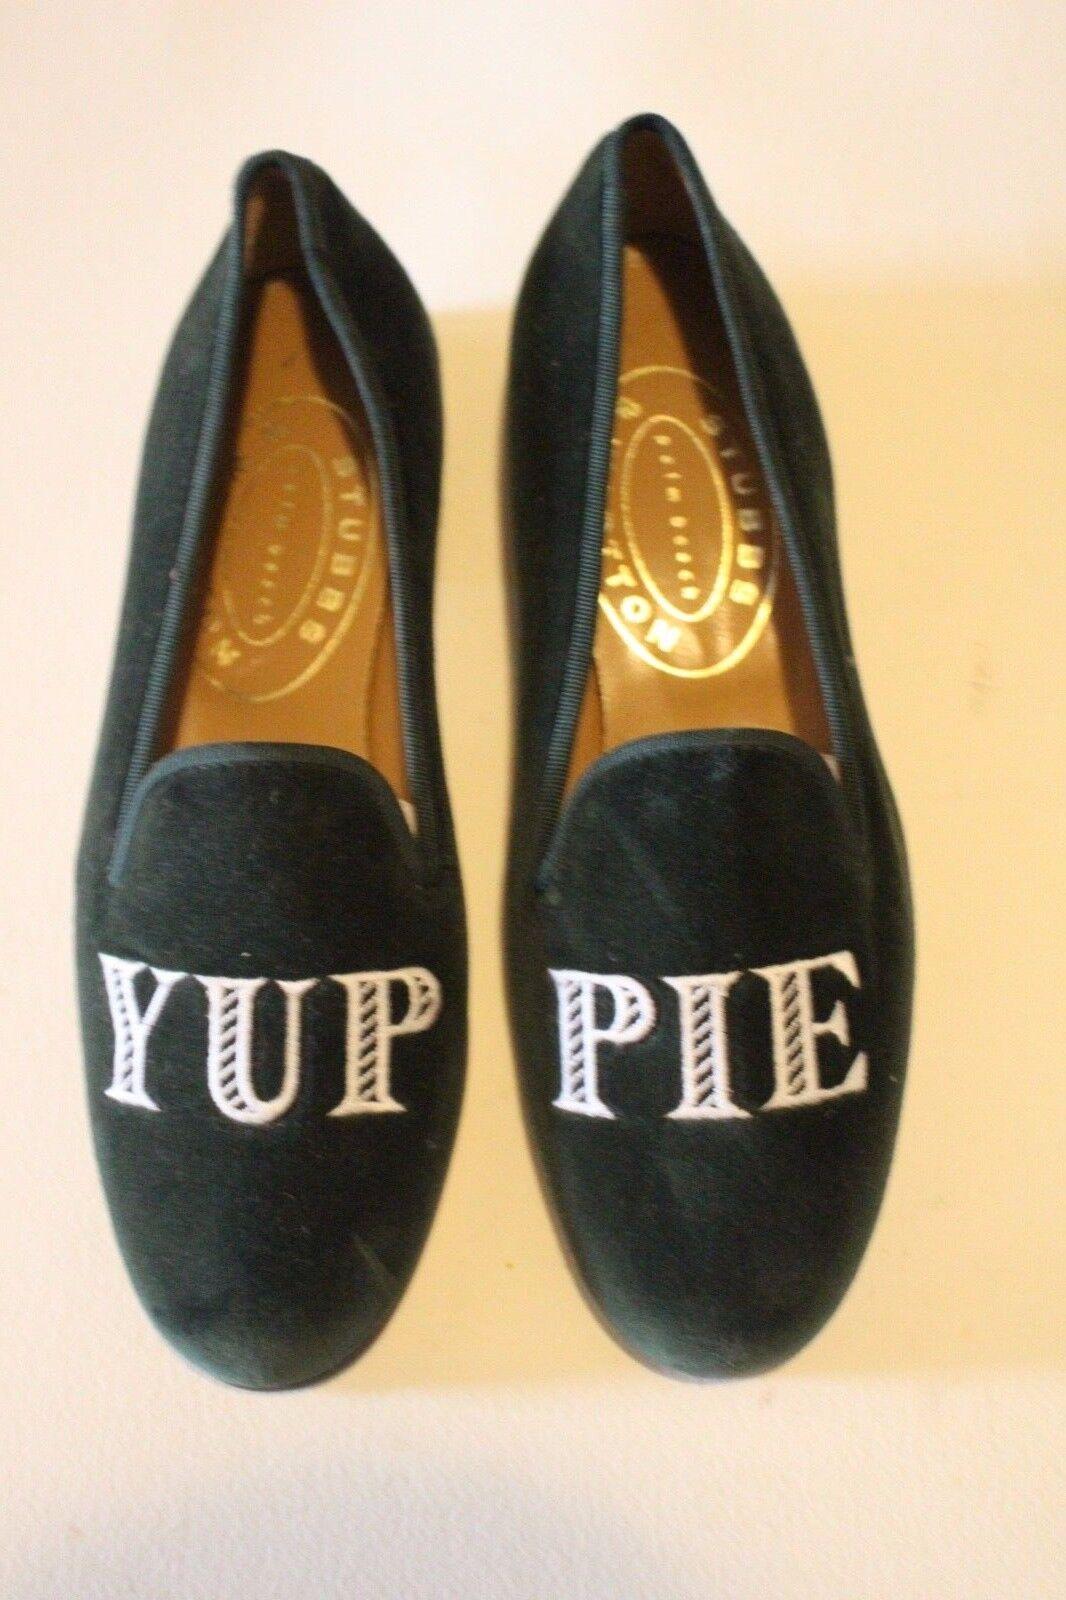 Terciopelo verde yuppie PREP Stubbs & Wootton Zapatillas para mujer Talla 7.5